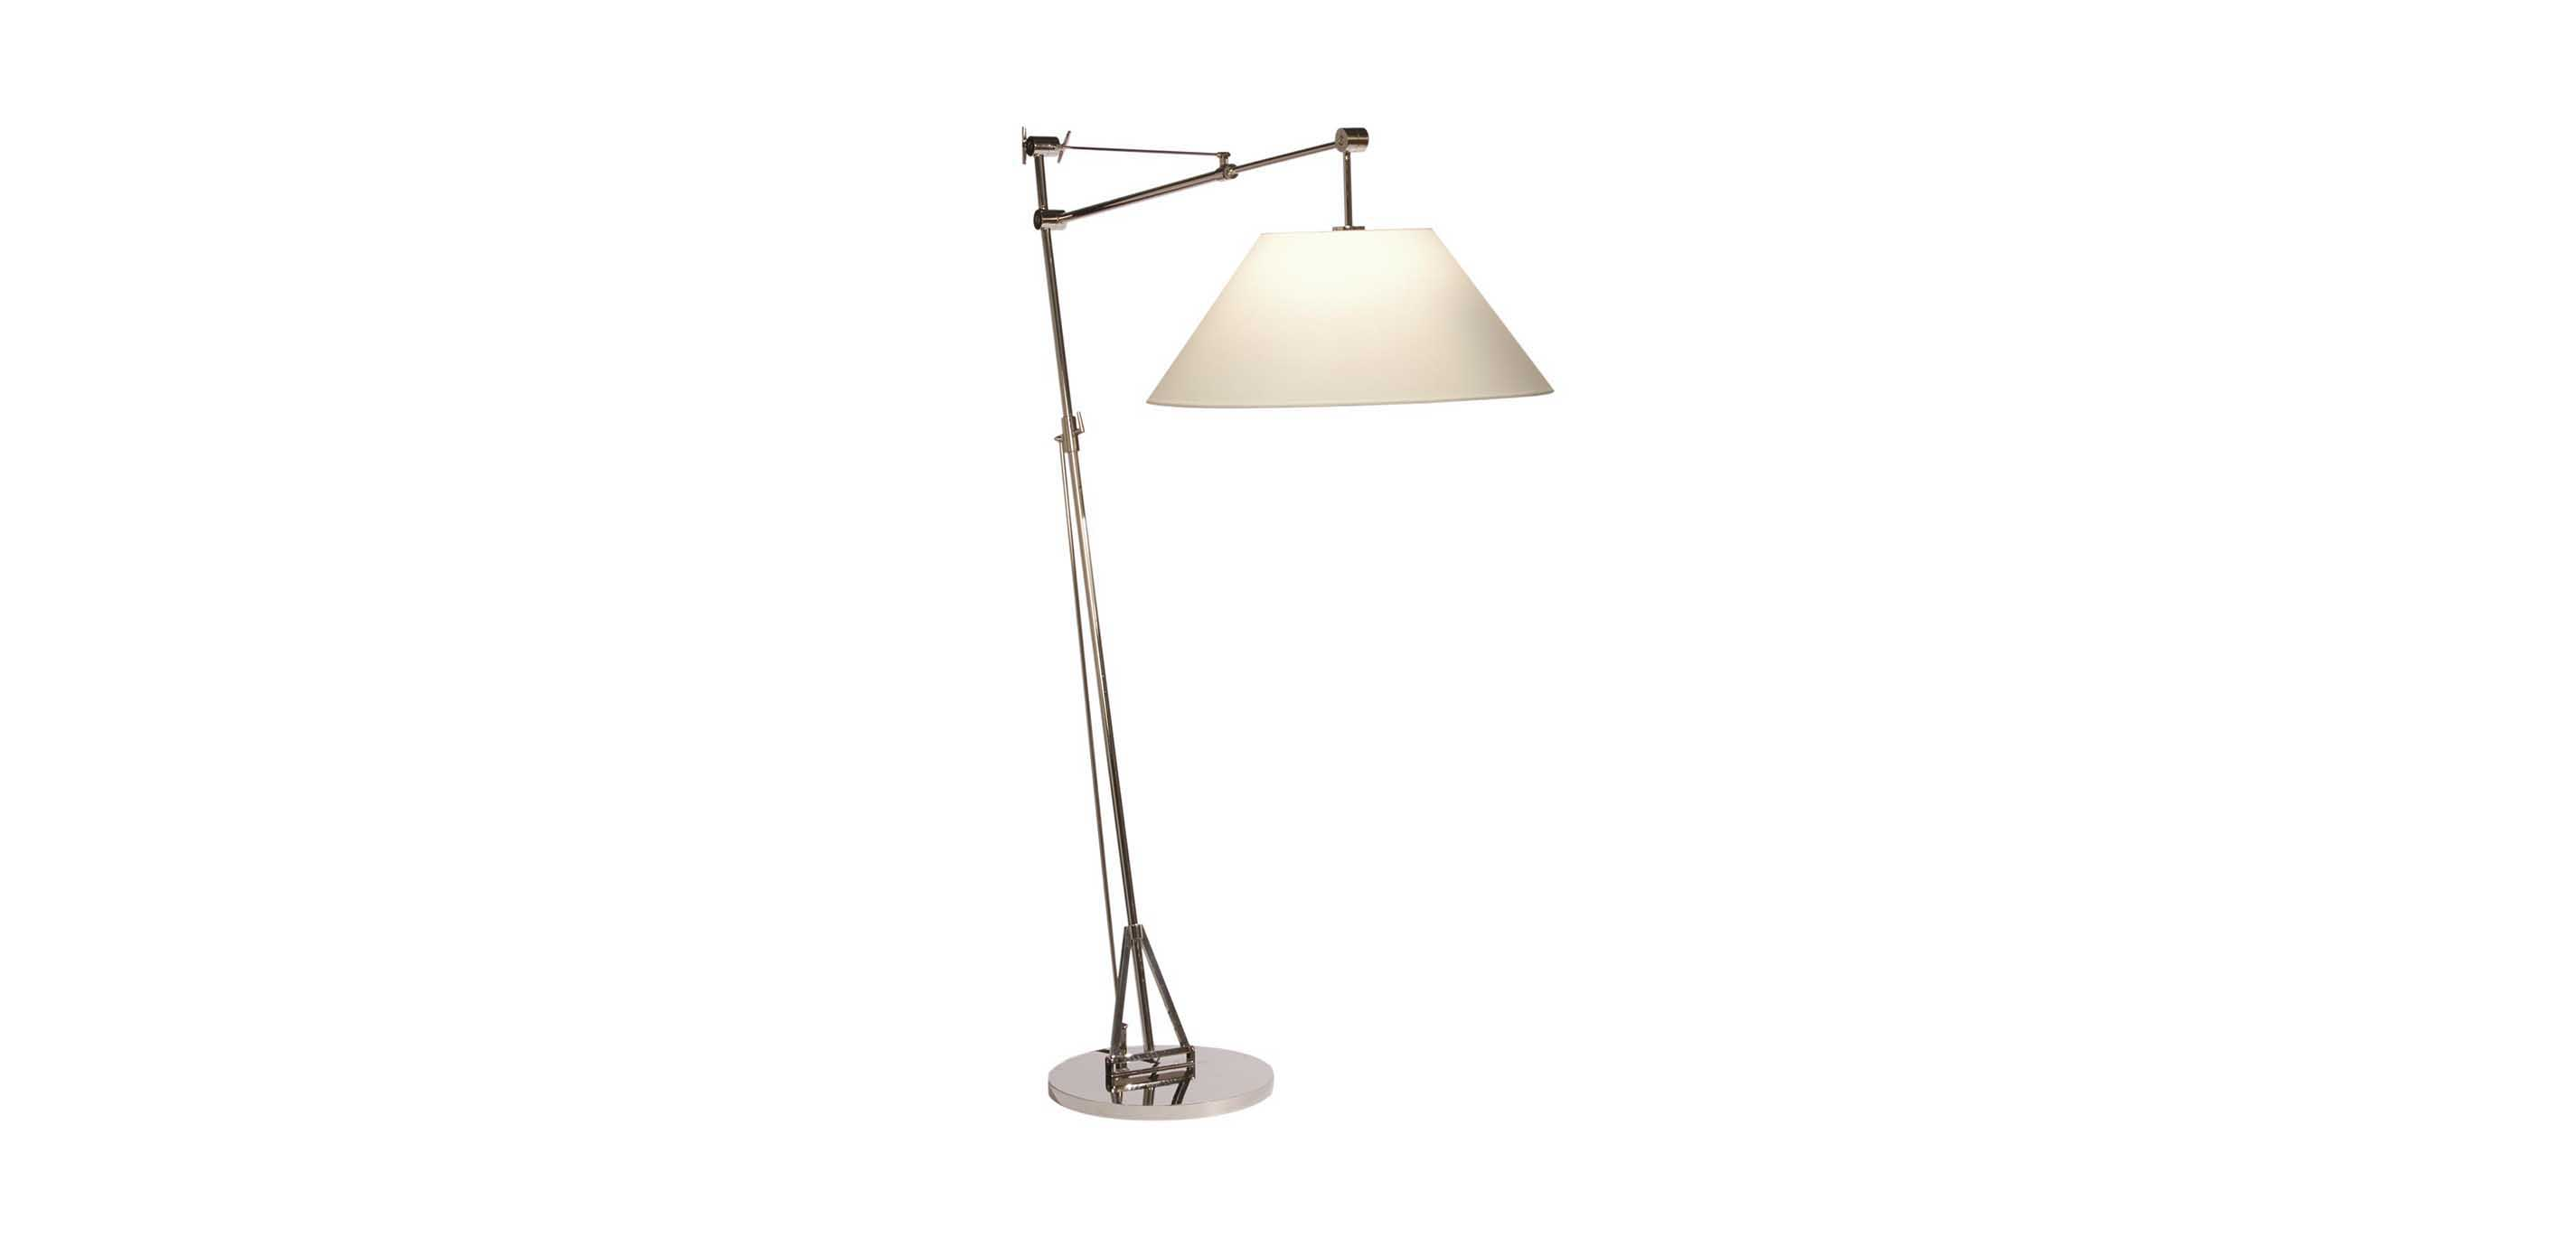 Long reach floor lamp floor lamps ethan allen images null aloadofball Gallery